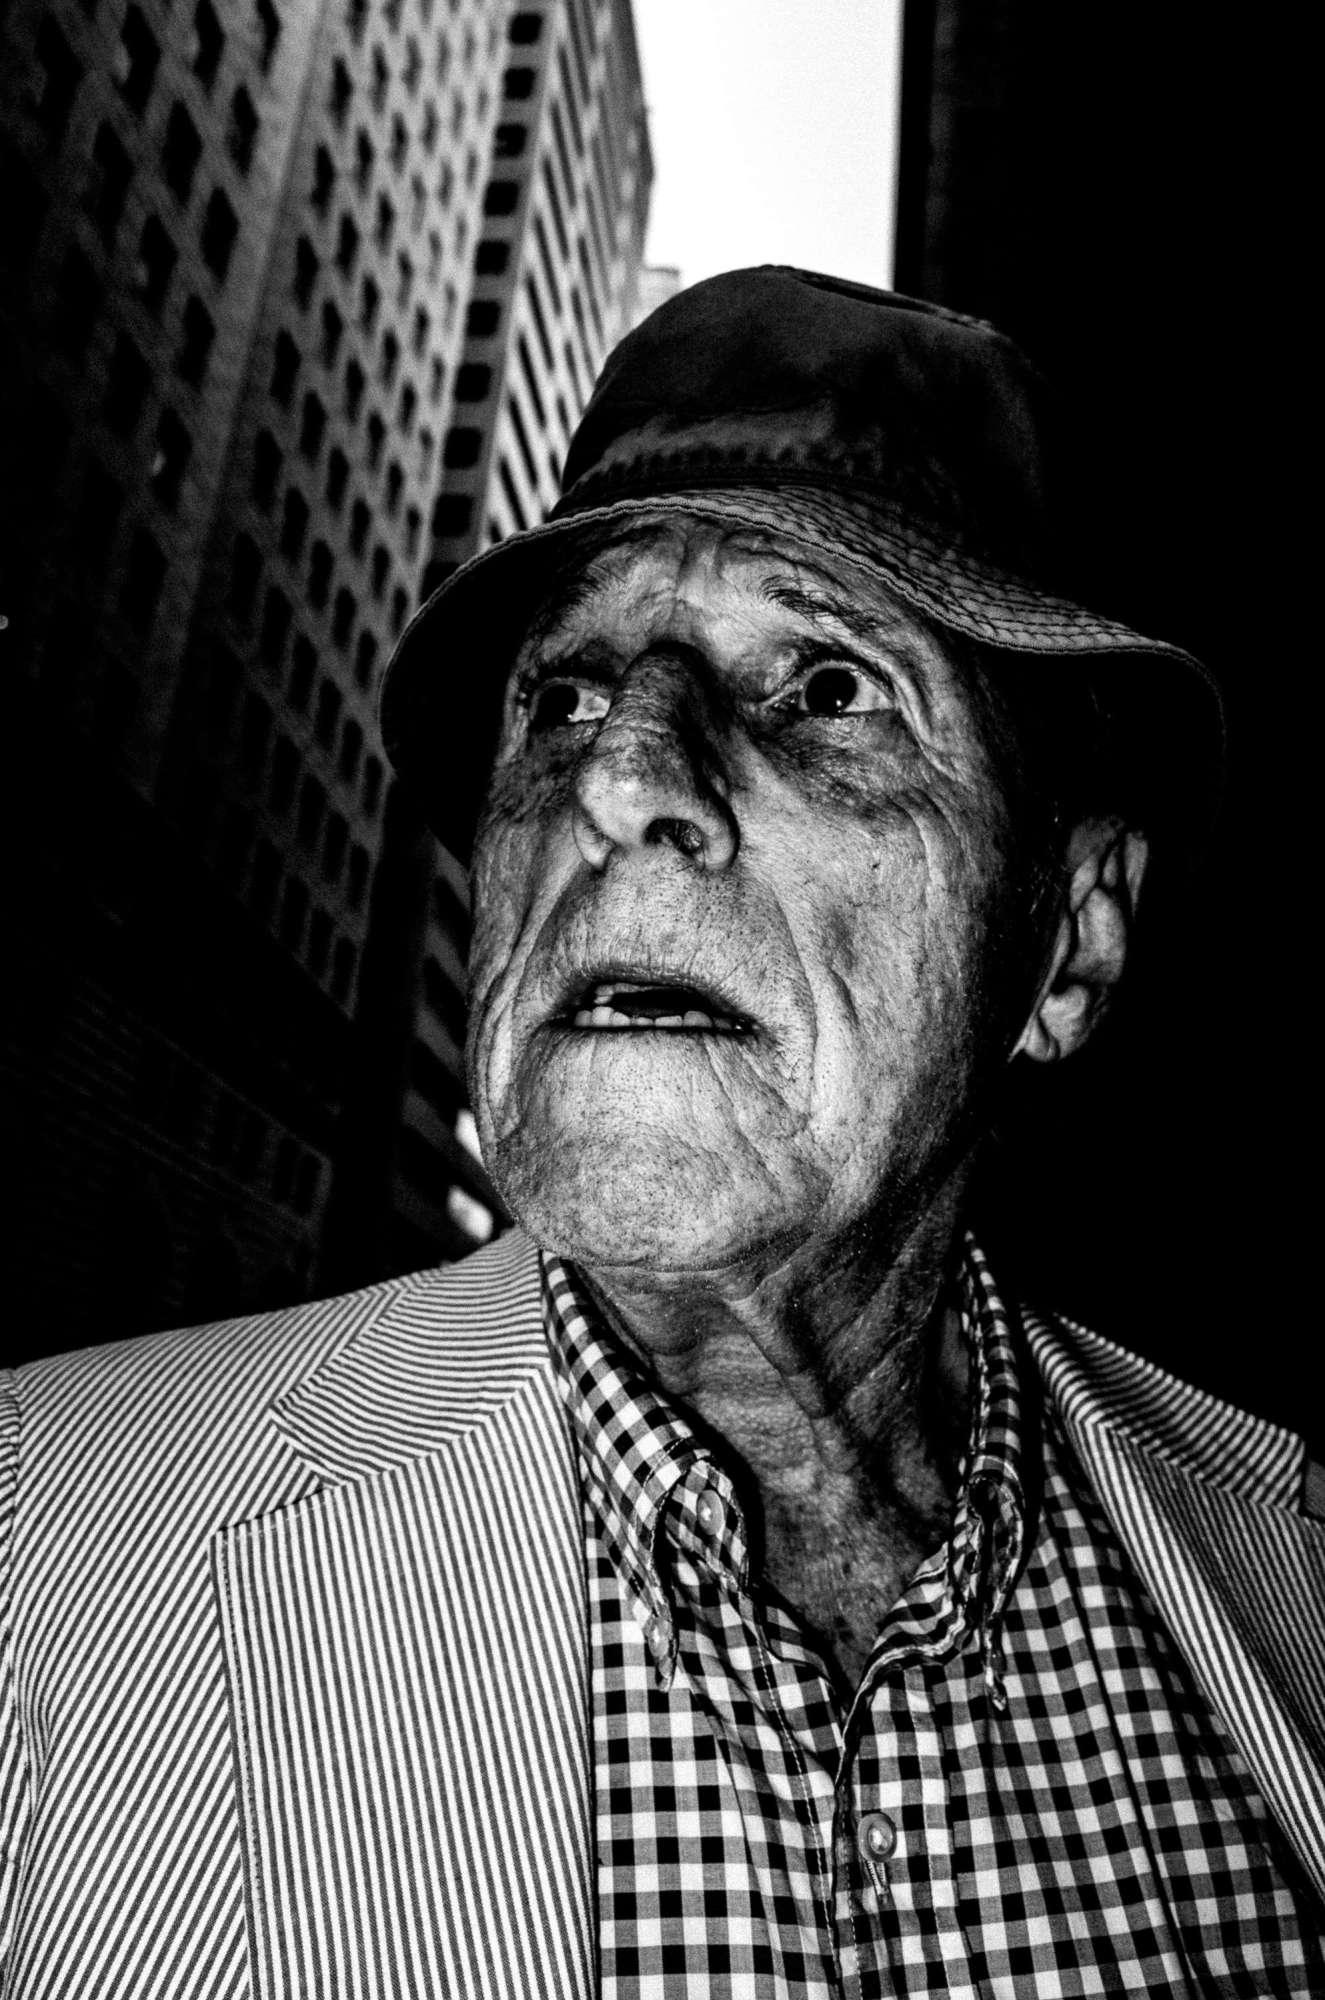 0-eric-kim-street-portrait-marty-sf